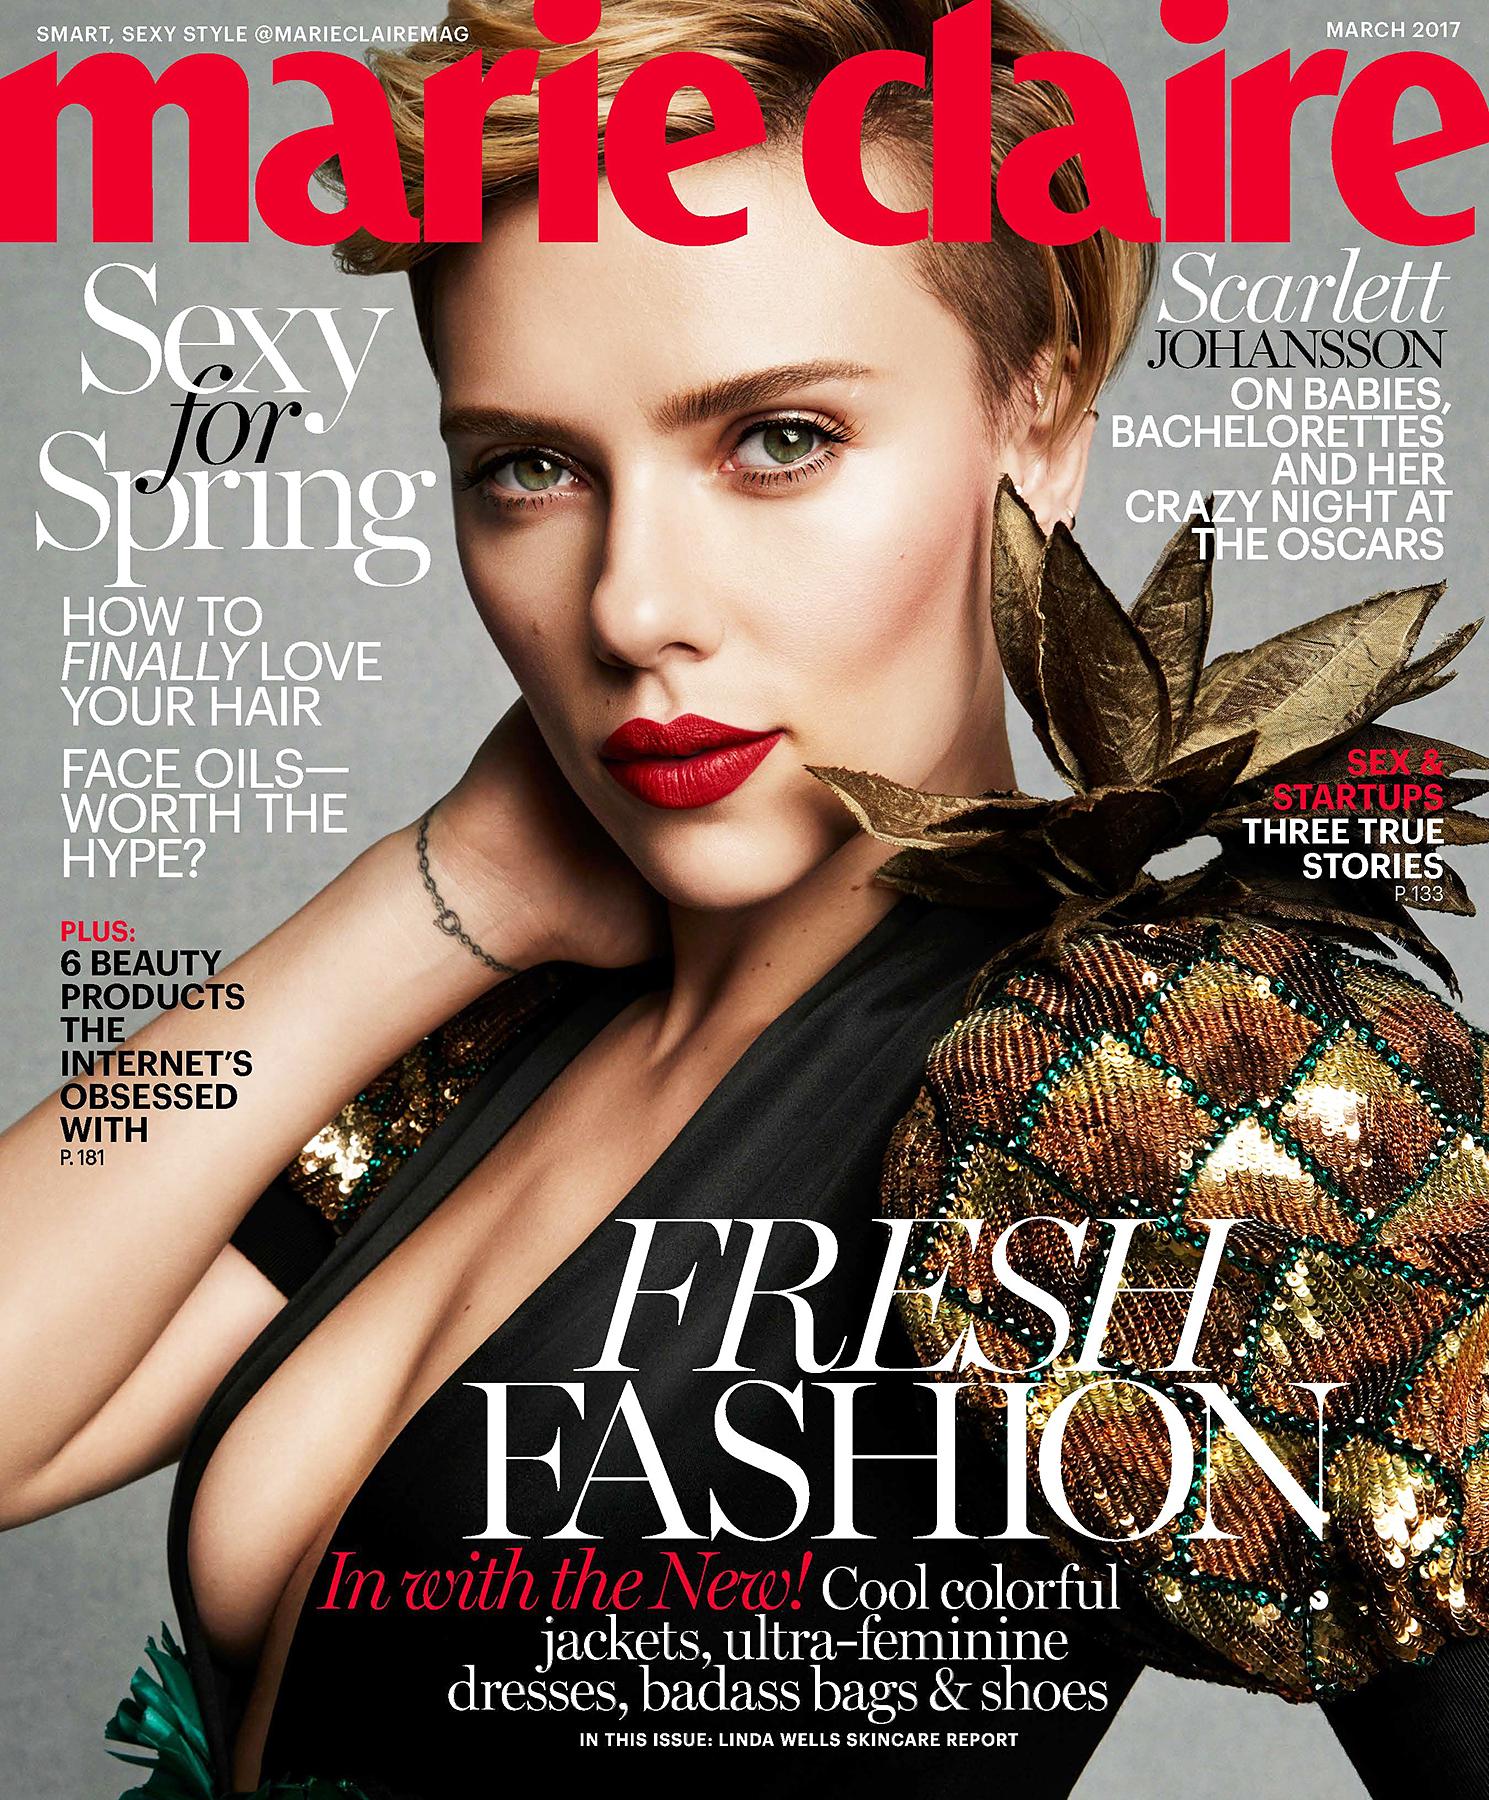 Scarlett Johansson Marie Claire cover